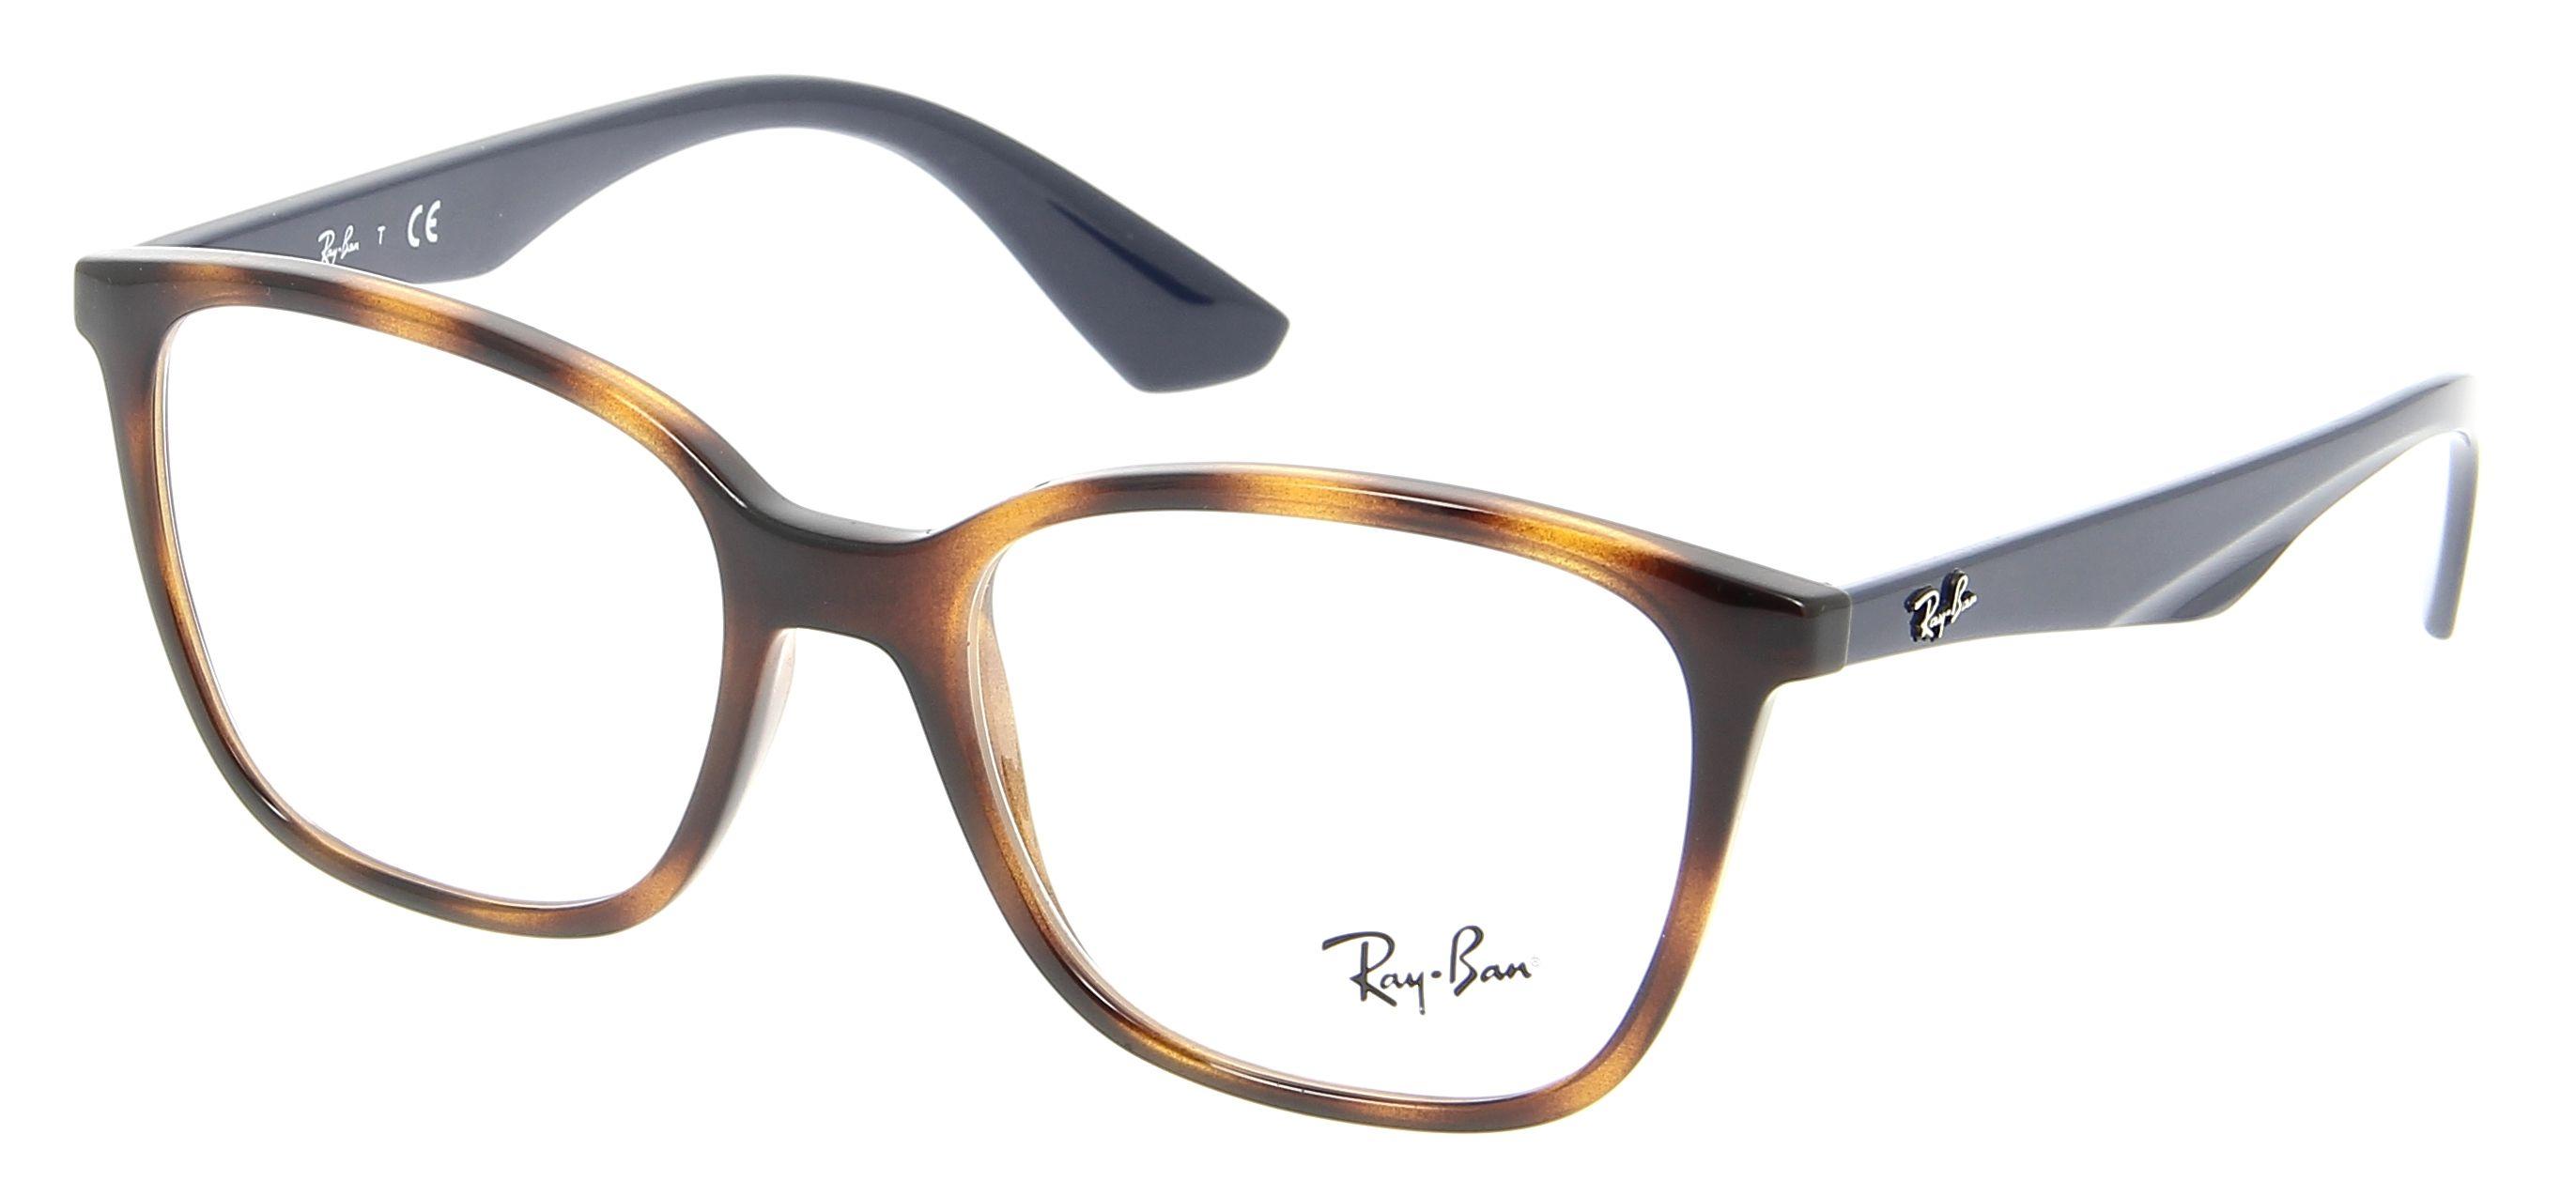 lunettes de vue ray ban femme ecaille video. Black Bedroom Furniture Sets. Home Design Ideas